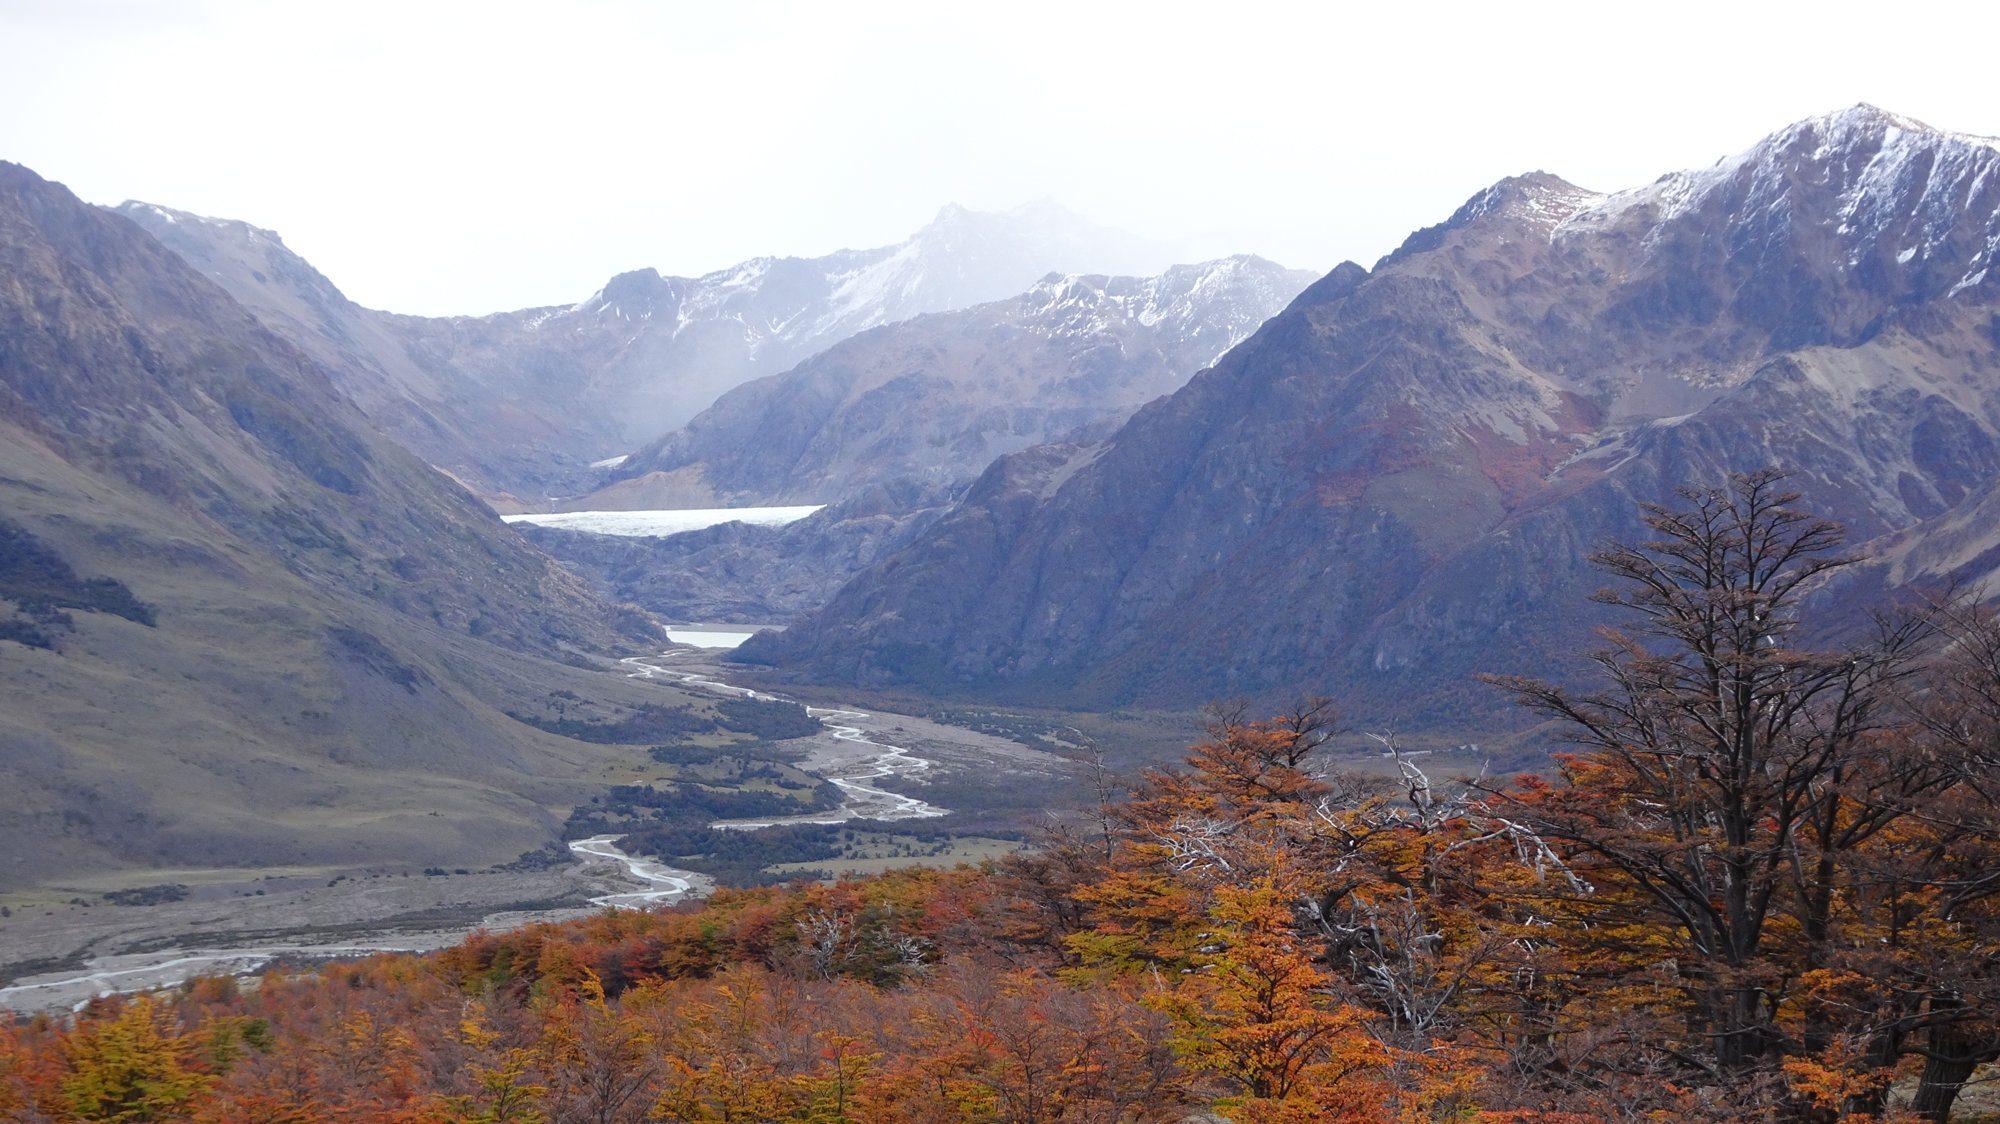 Rio Toro, Huemul Circuit, El Chaltén, Patagonien, Argentinien, Wanderung, Trekking